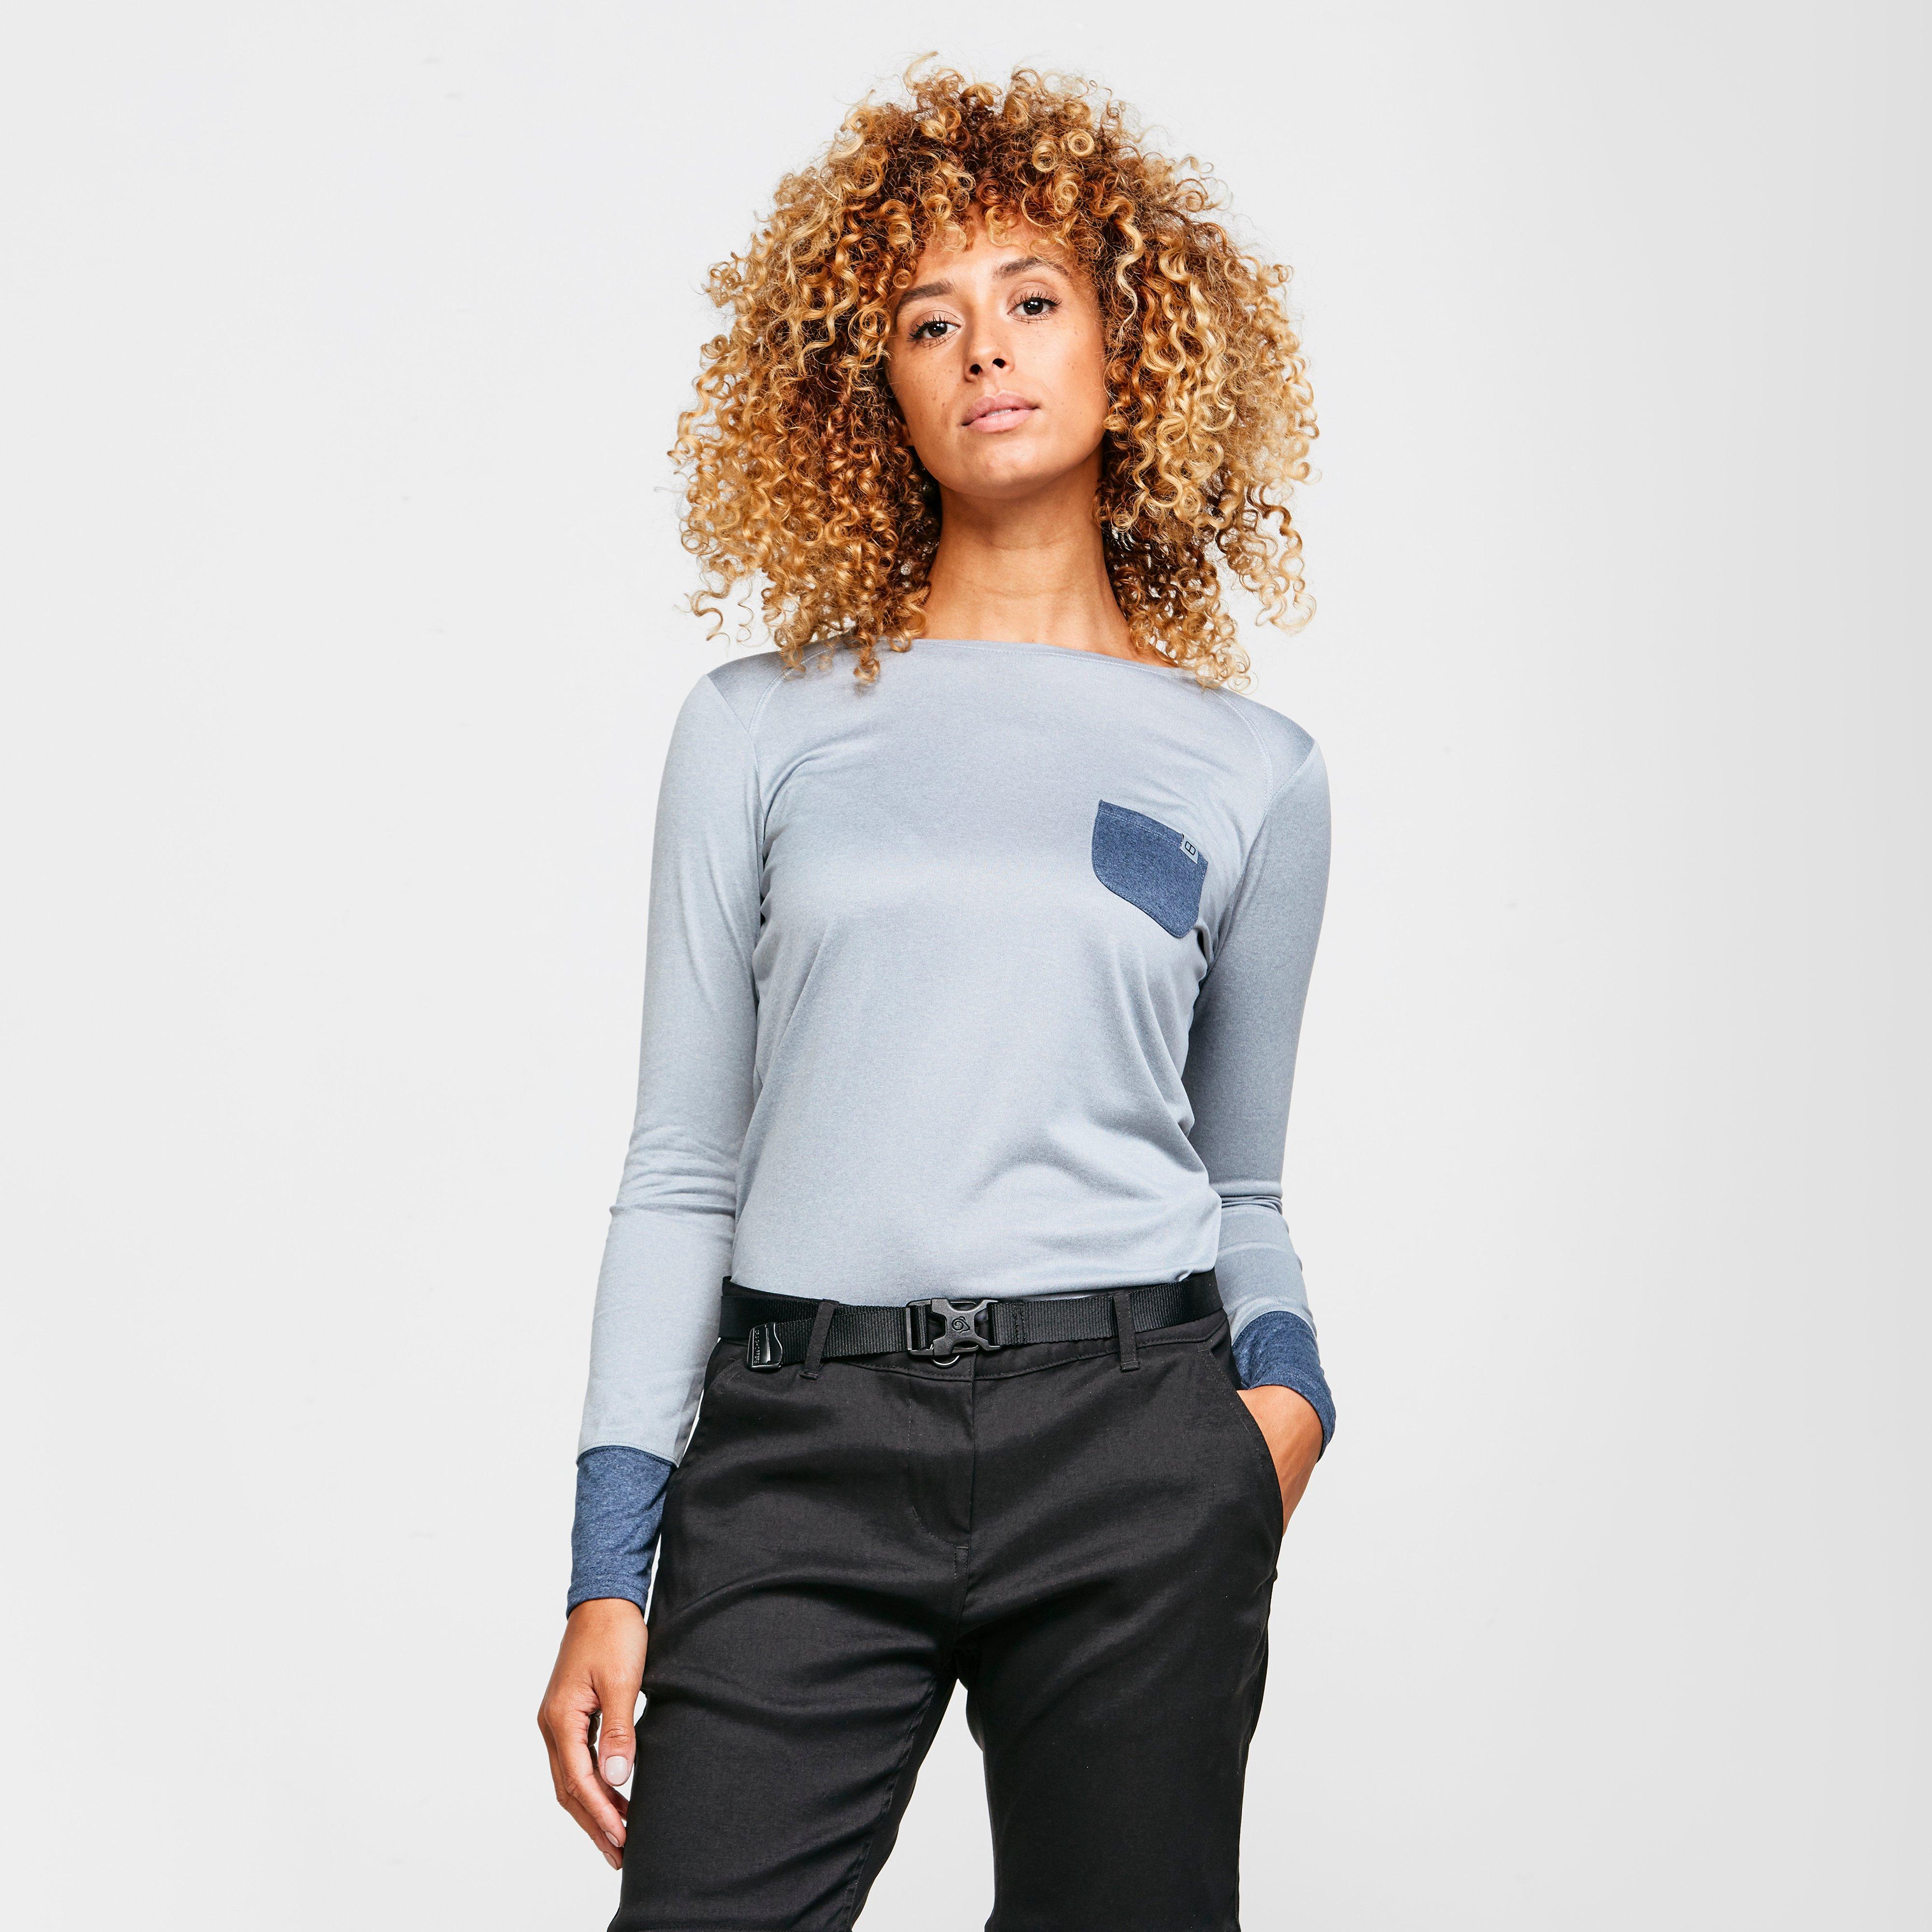 Berghaus Womens Explorer Long Sleeve Crew T-shirt - Grey/gry  Grey/gry